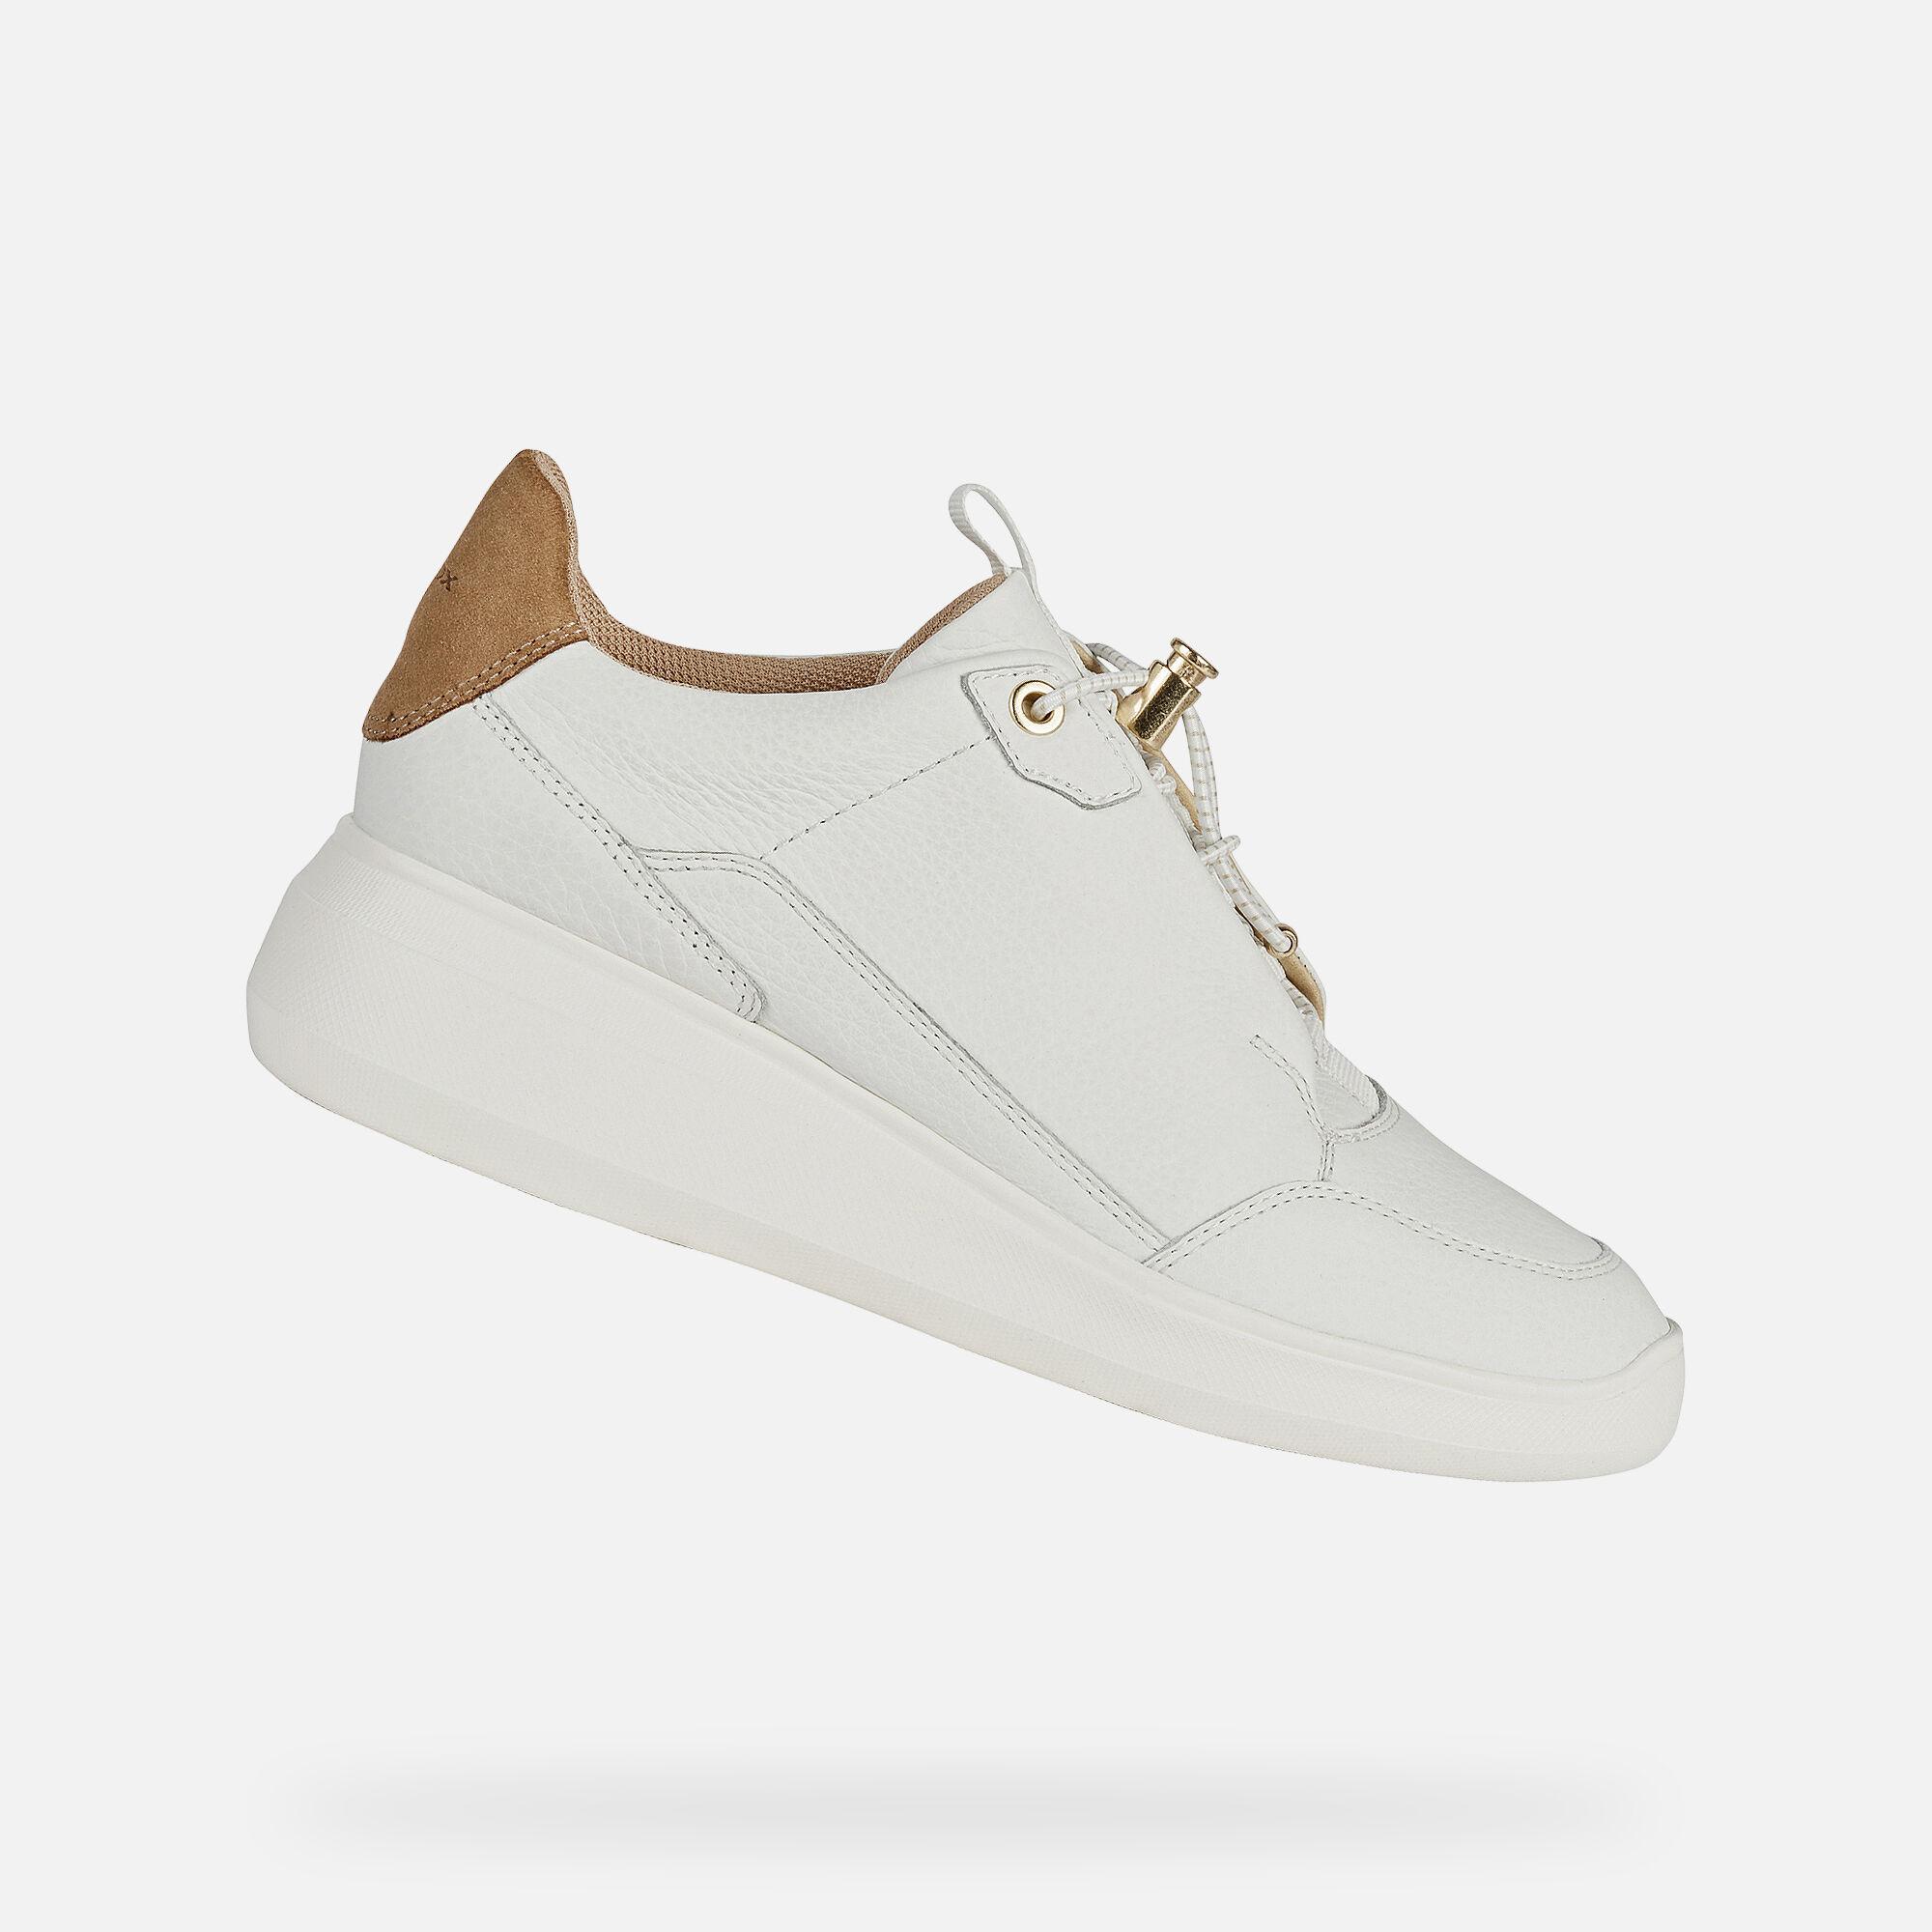 Geox RUBIDIA Woman: White Sneakers